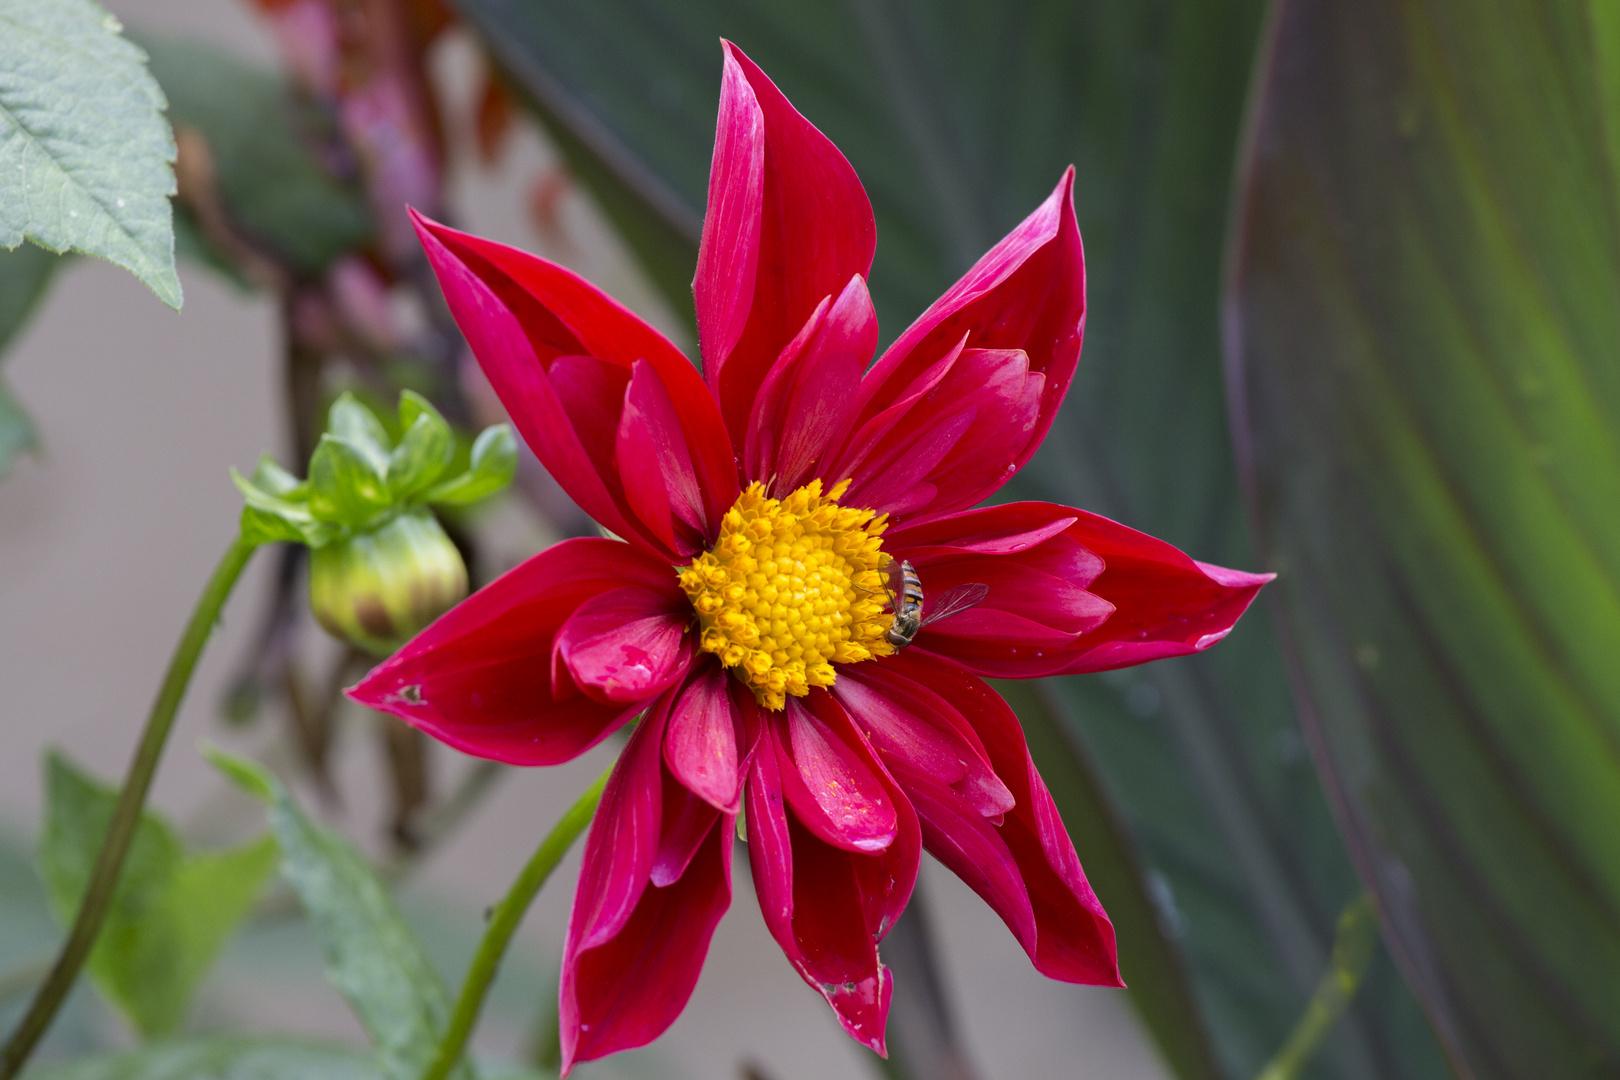 Blüte mit Insekt Wilhelma 3